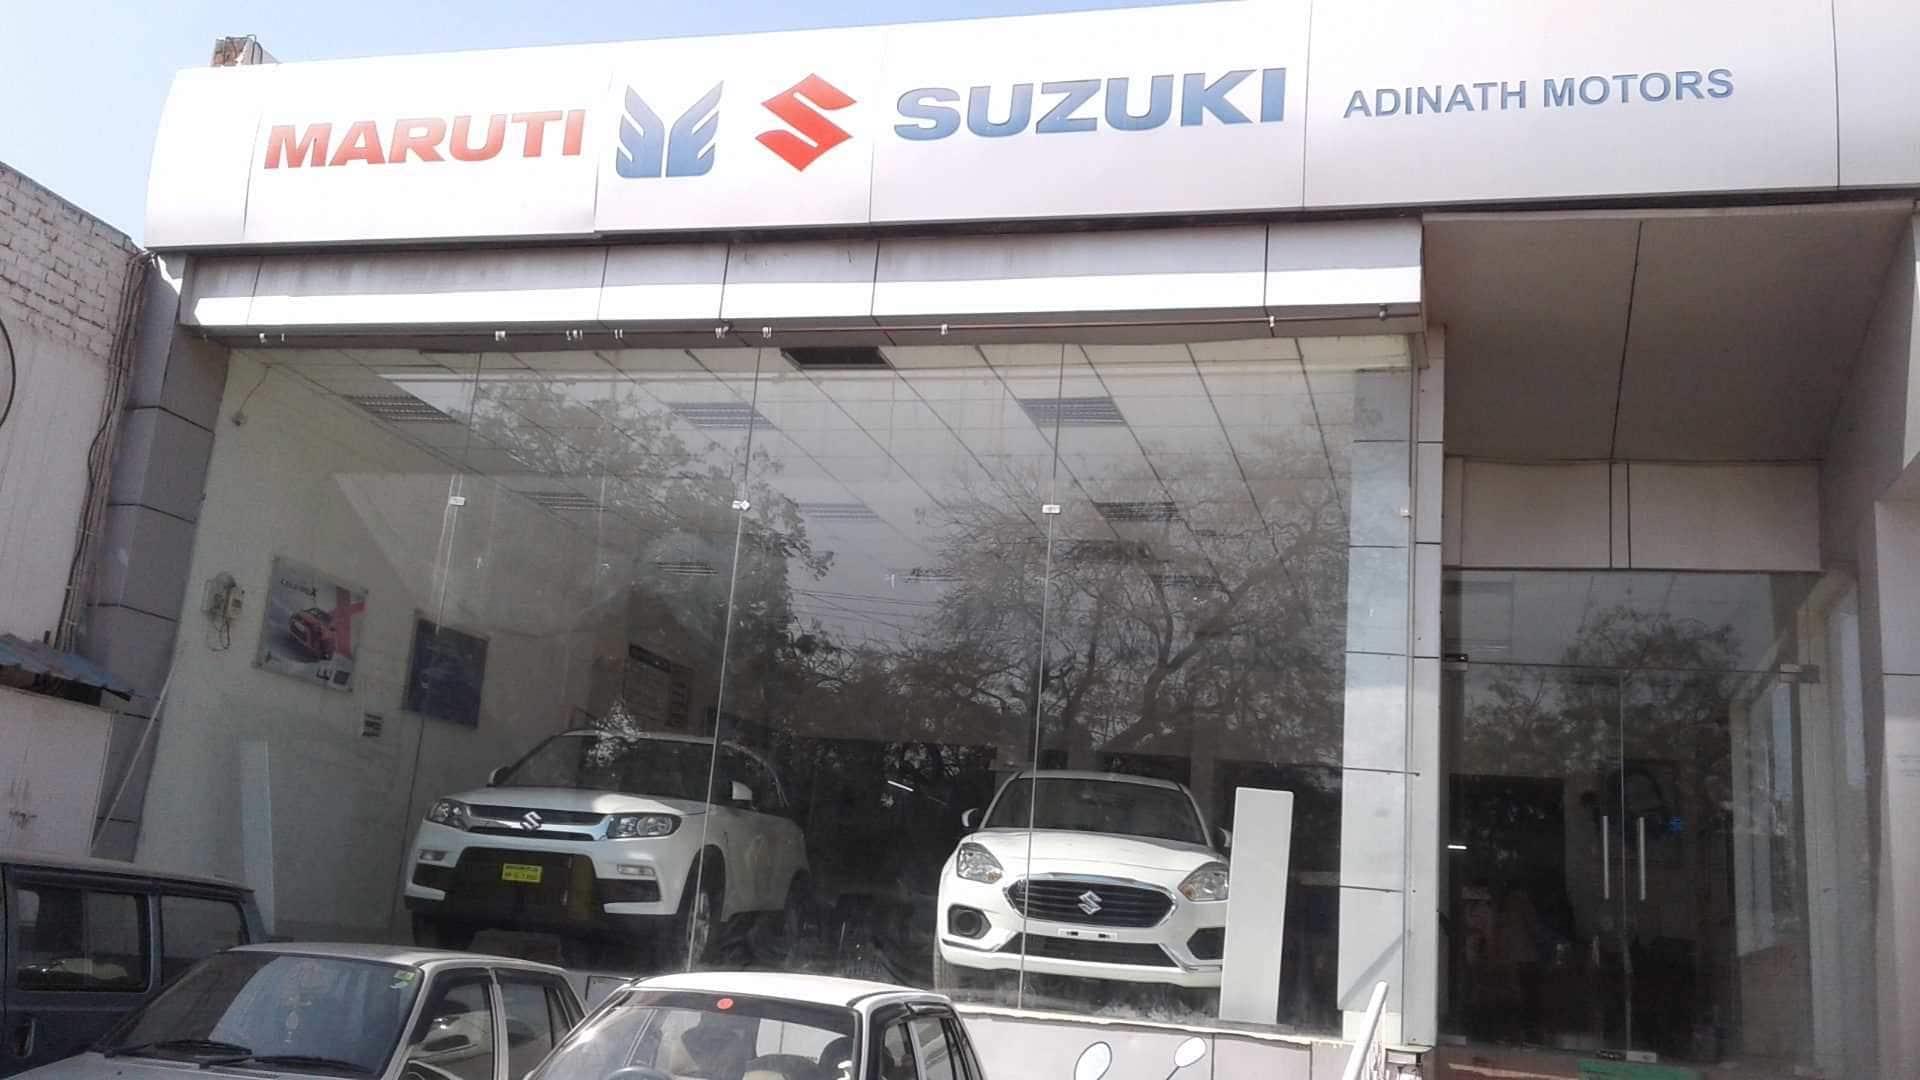 Suzuki Car Dealership >> Top Maruti Suzuki Car Dealers In Chhatarpur Best Maruti Suzuki Car